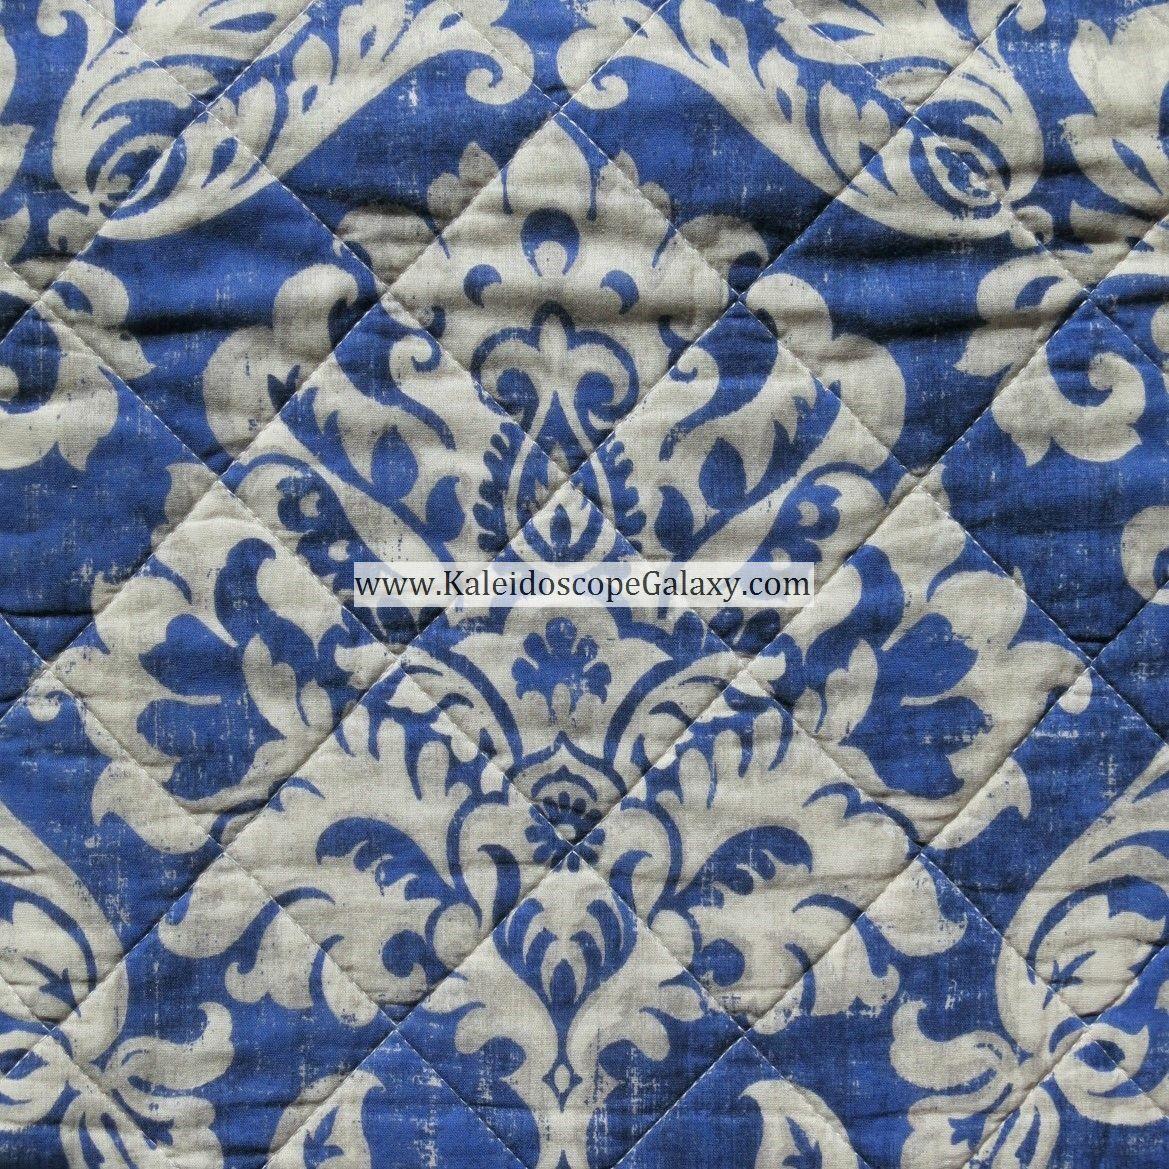 Blau BEIGE TAN 3pc KING QUILT FLORAL DAMASK MEDALLION REVERSIBLE STRIPE TAHARI